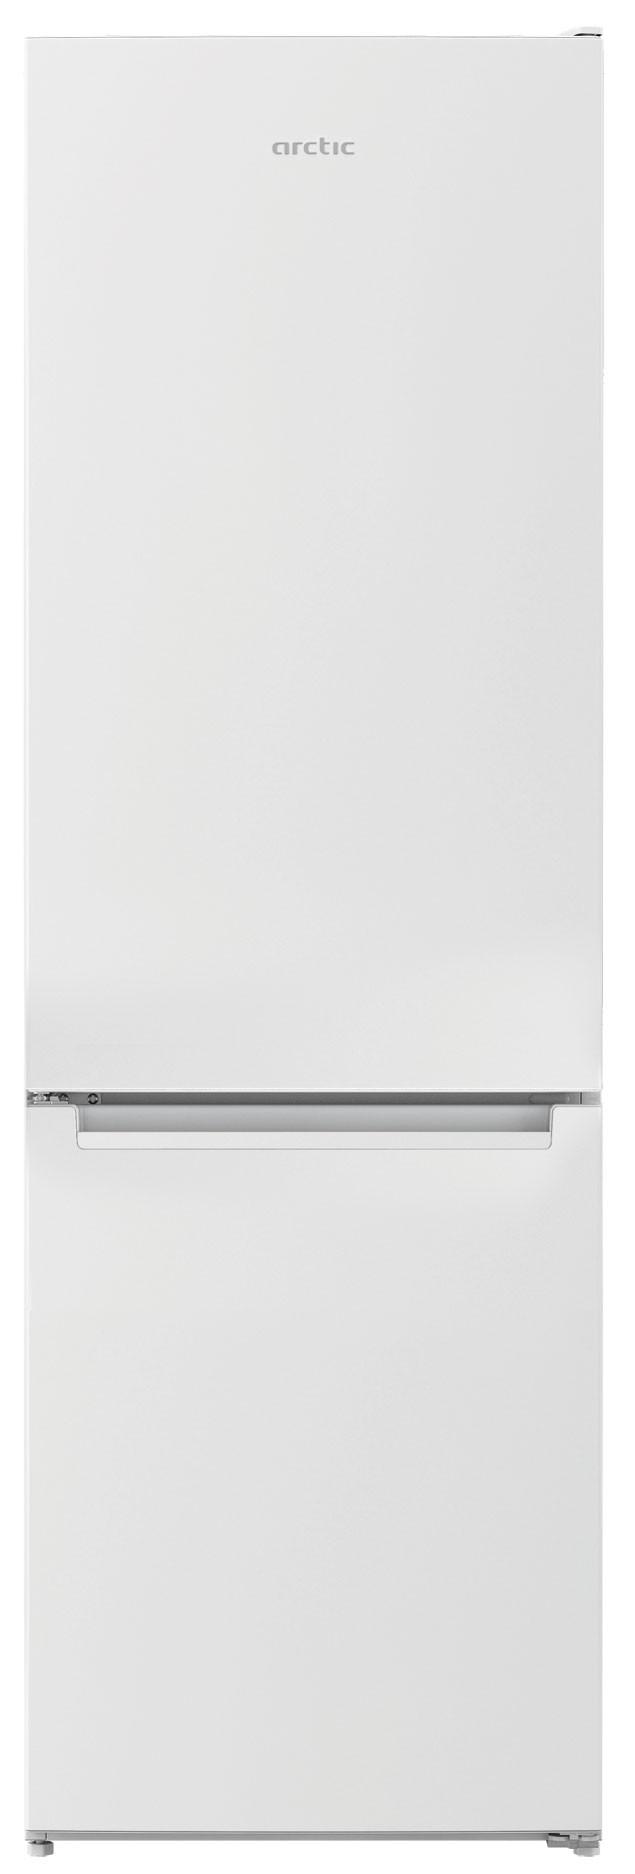 Combina frigorifica, Arctic, AK54305M30W, 291 l, Clasa F, H 181,3  cm, Alb